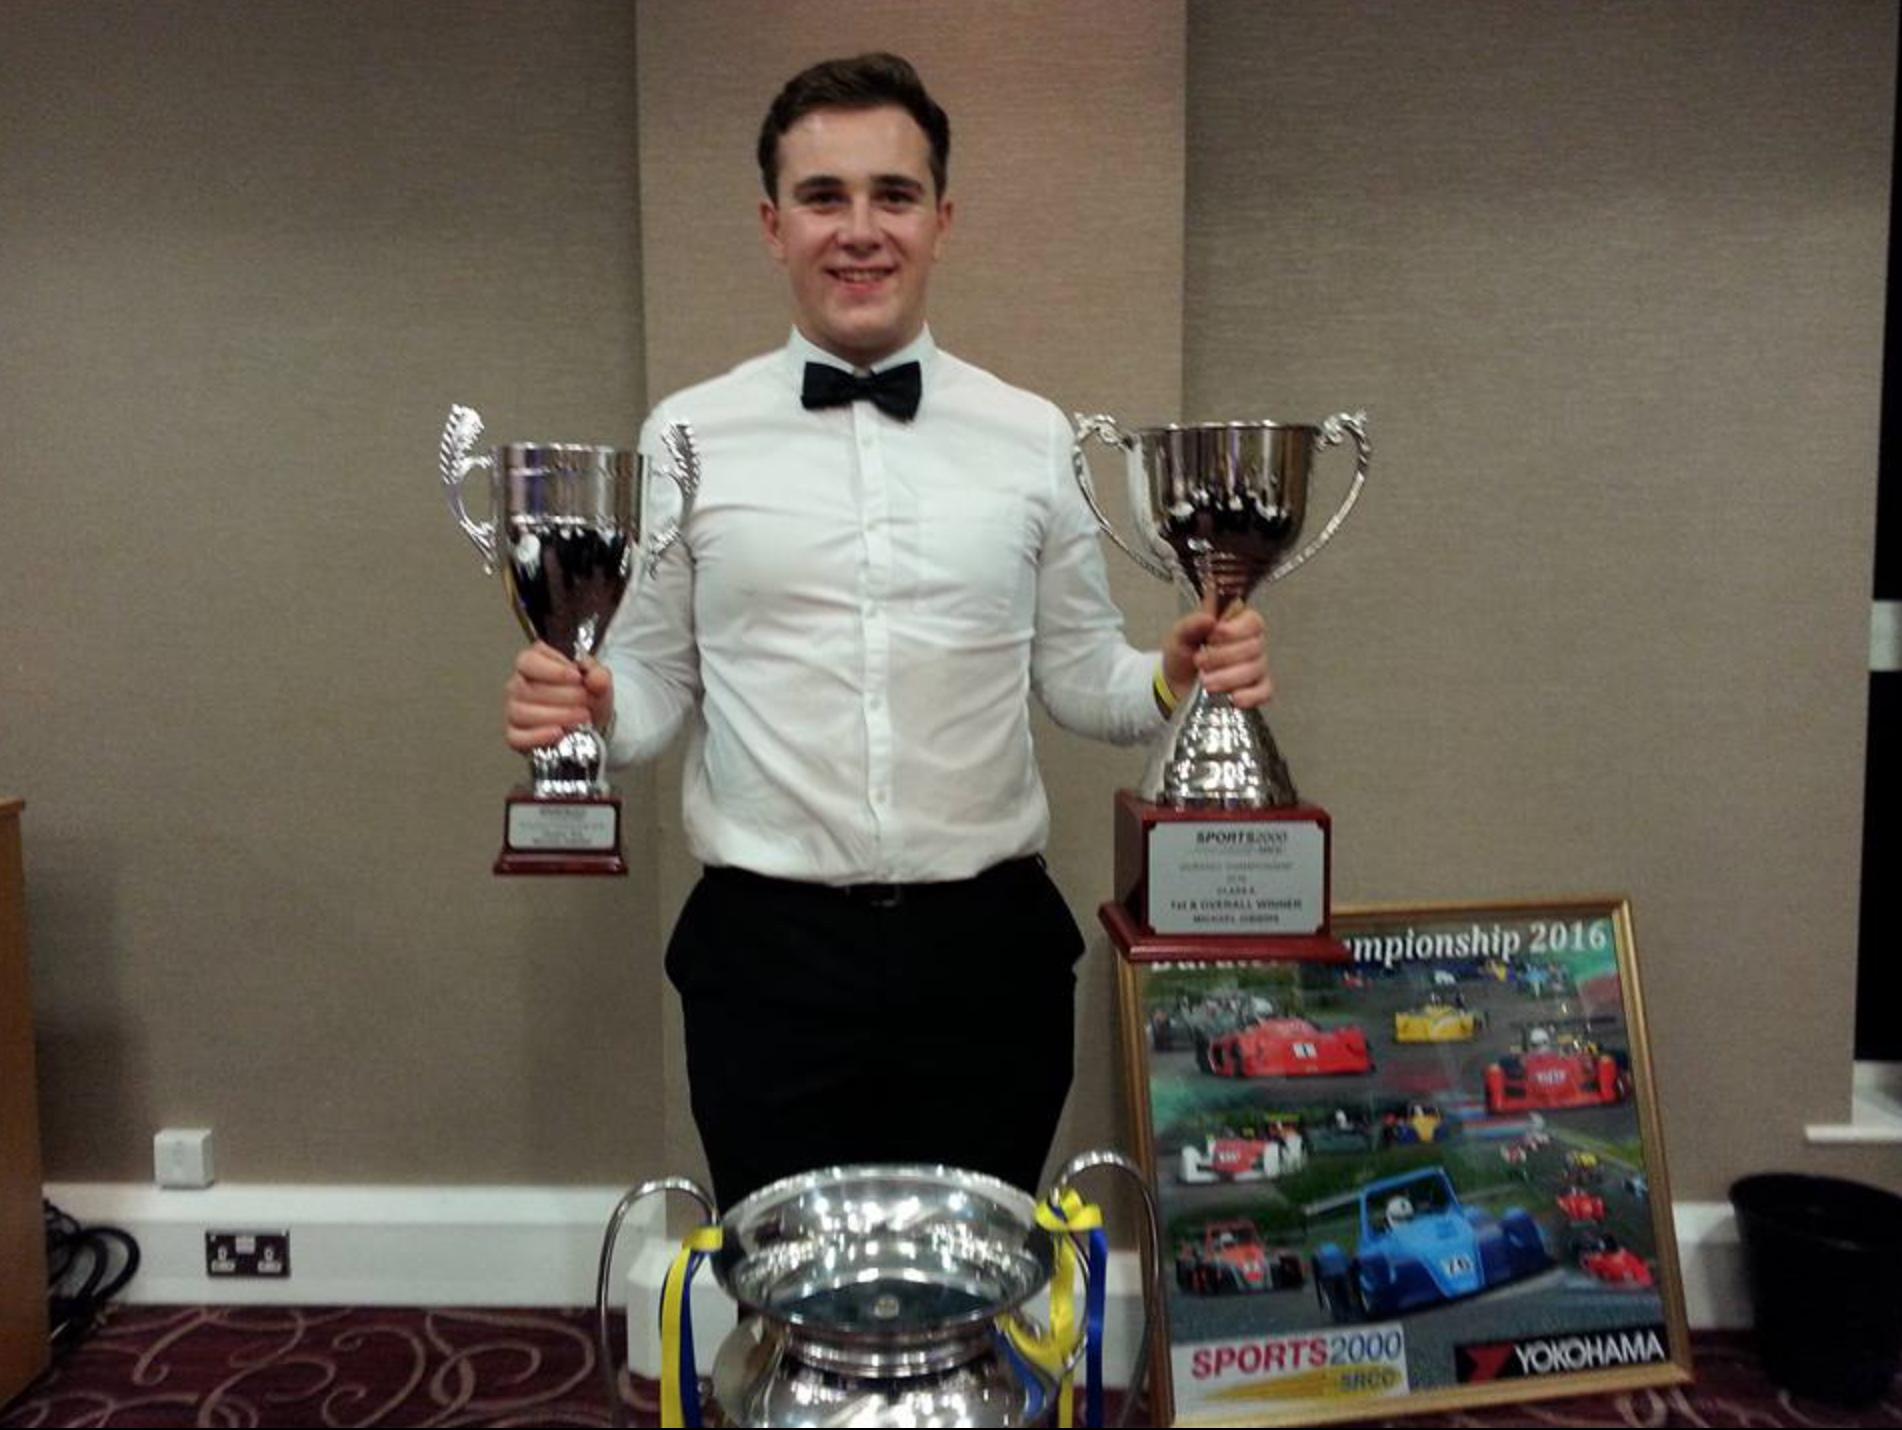 Michael Gibbins 1st Overall Sports 2000 Duratec Championship 2016